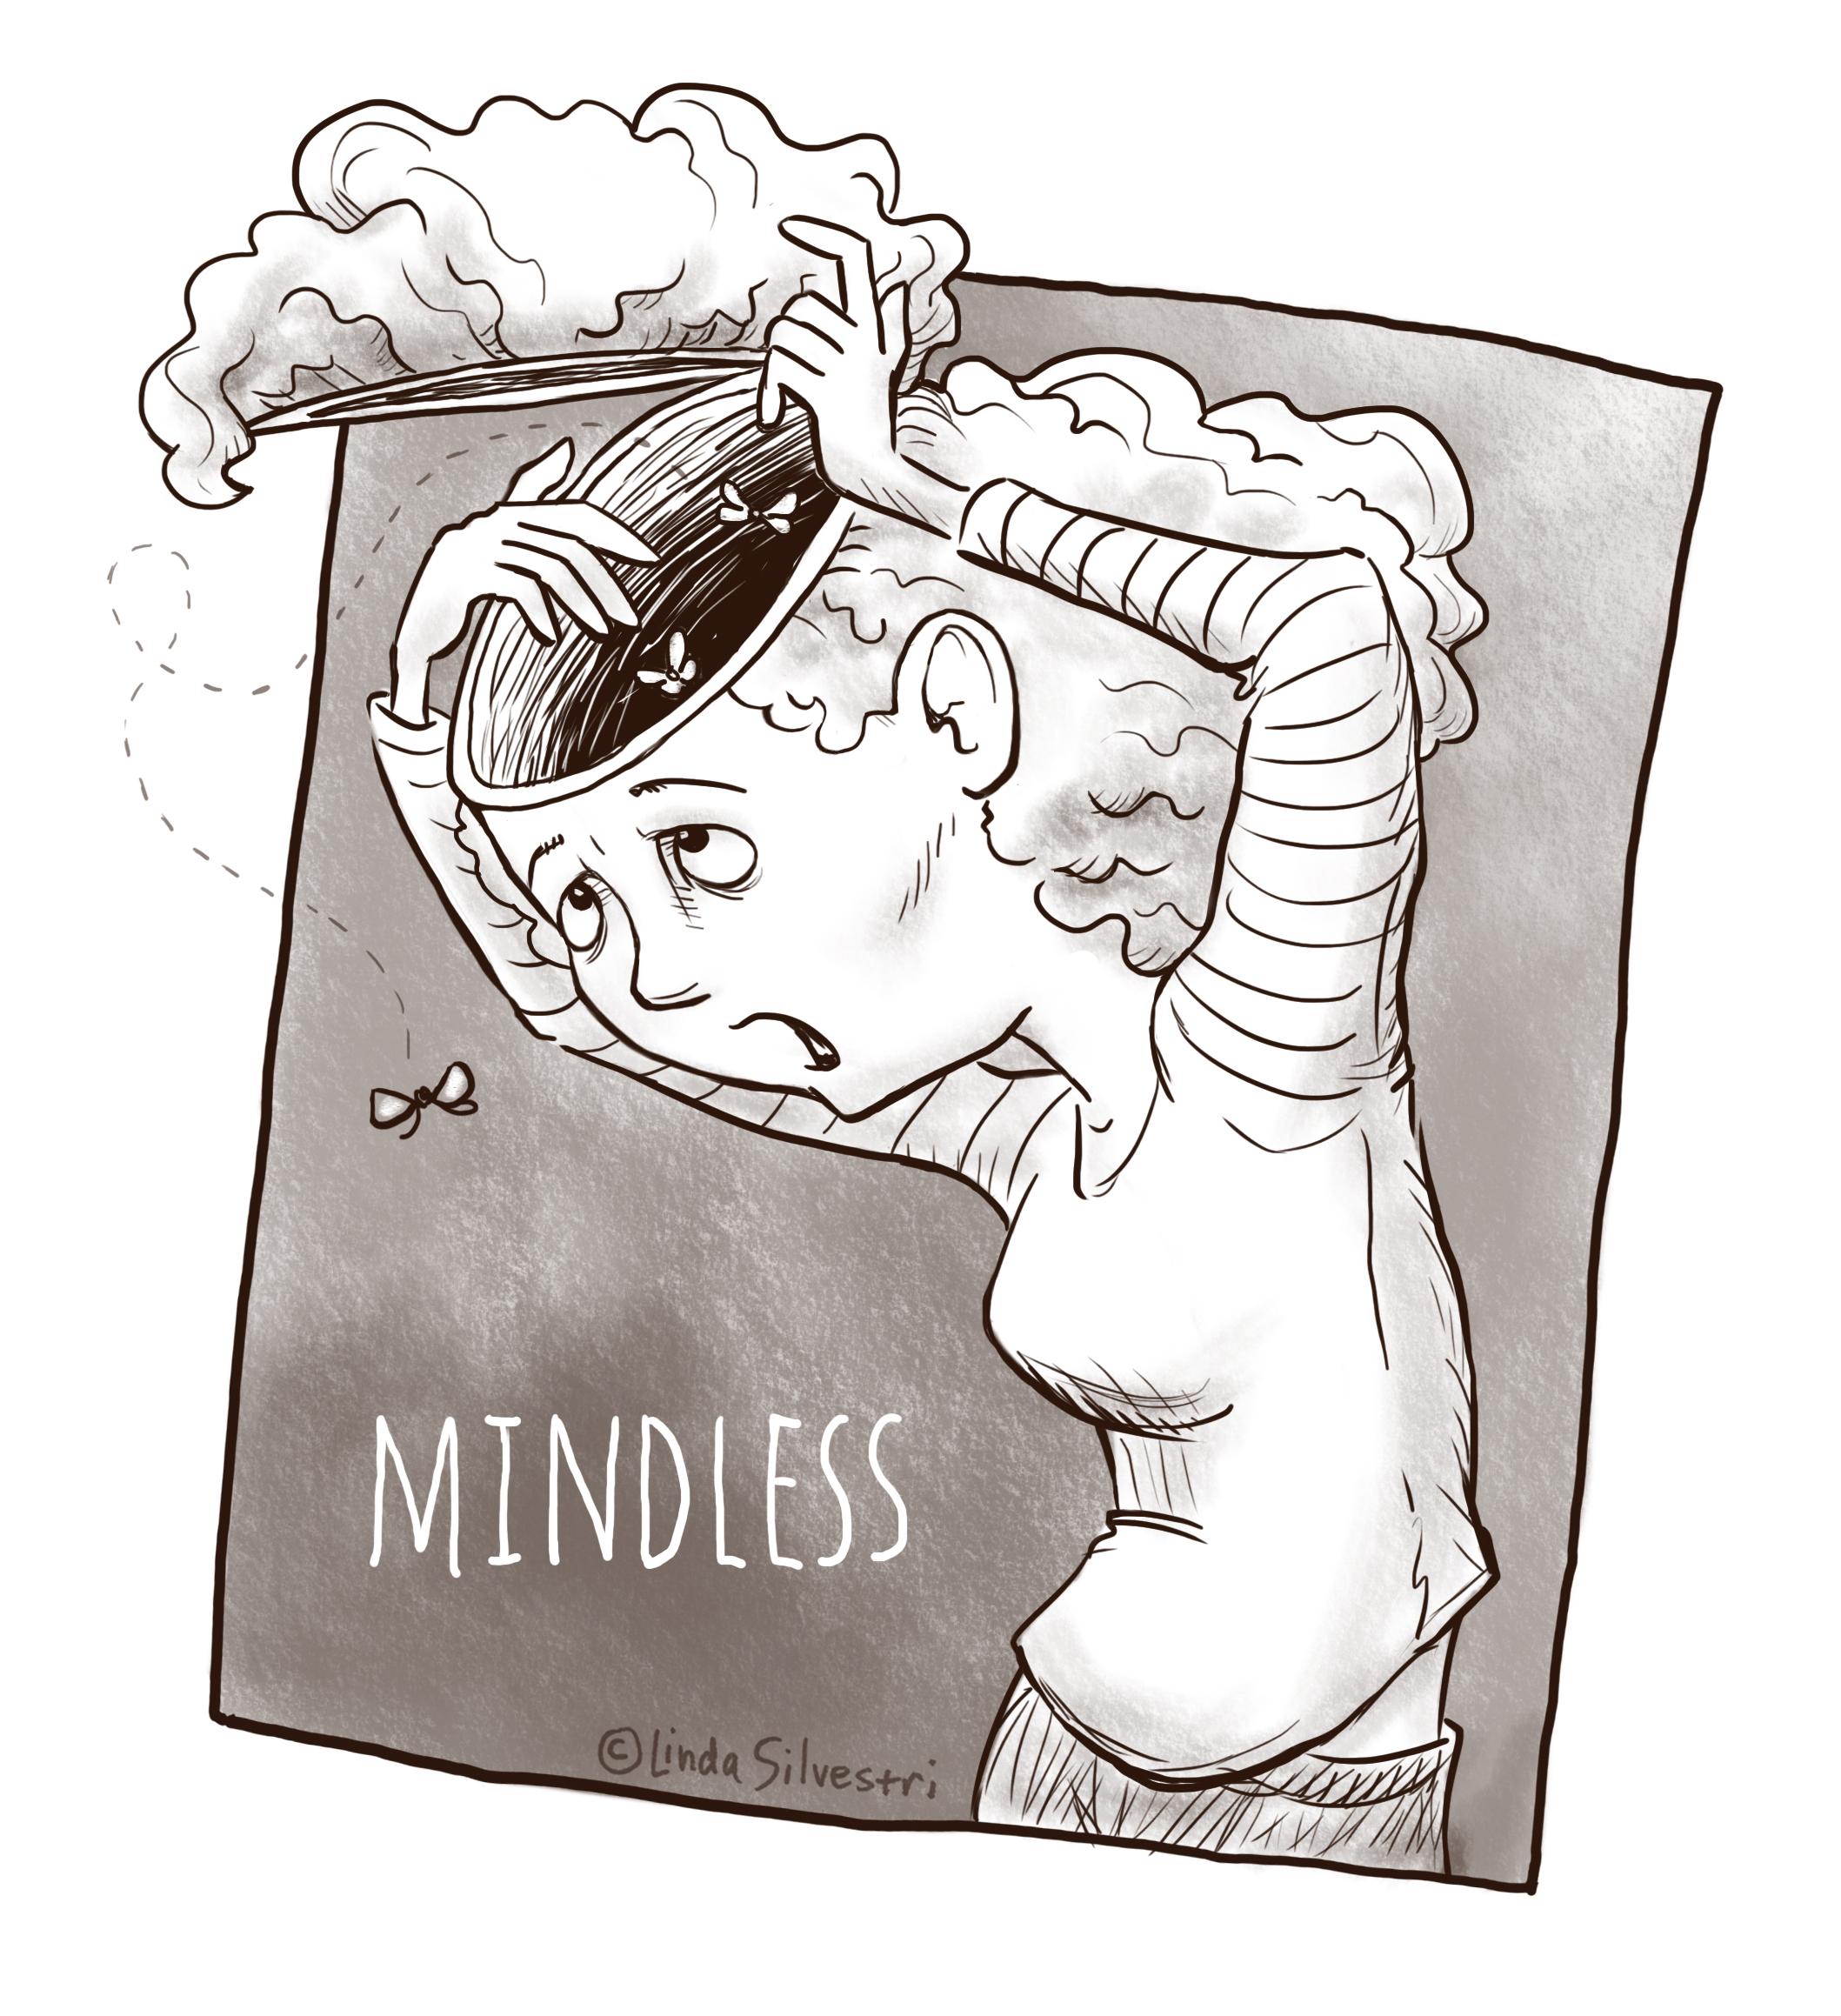 Inktober mindless 3